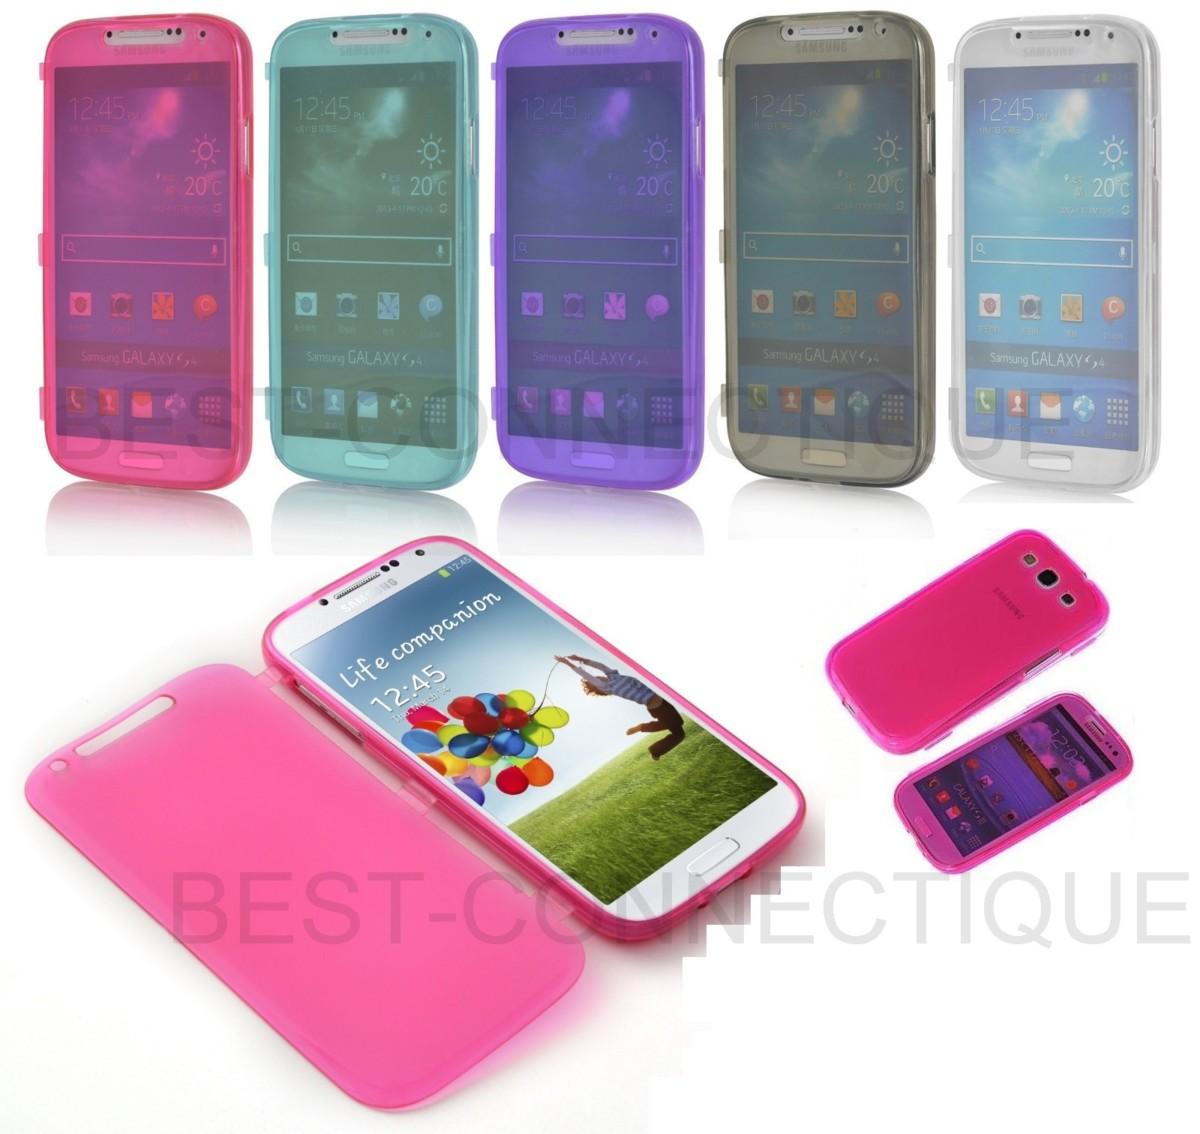 Etui Housse Coque Gel Rabat Samsung Galaxy S2 S3 S4 S5 S6 MINI NOTE 2